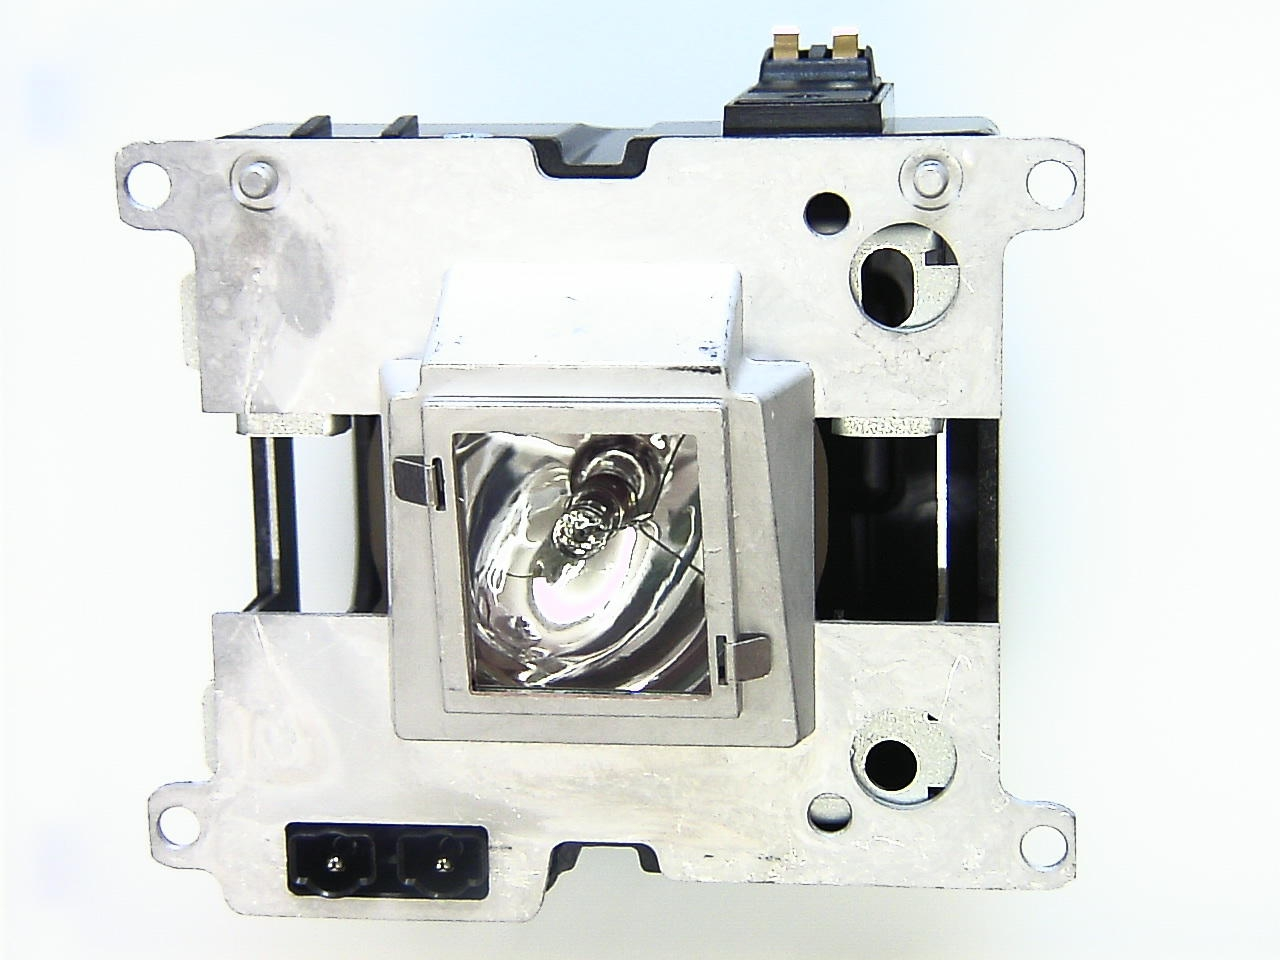 Original Dual Lámpara For DIGITAL PROJECTION MORPHEUS 8000HDI Proyector.